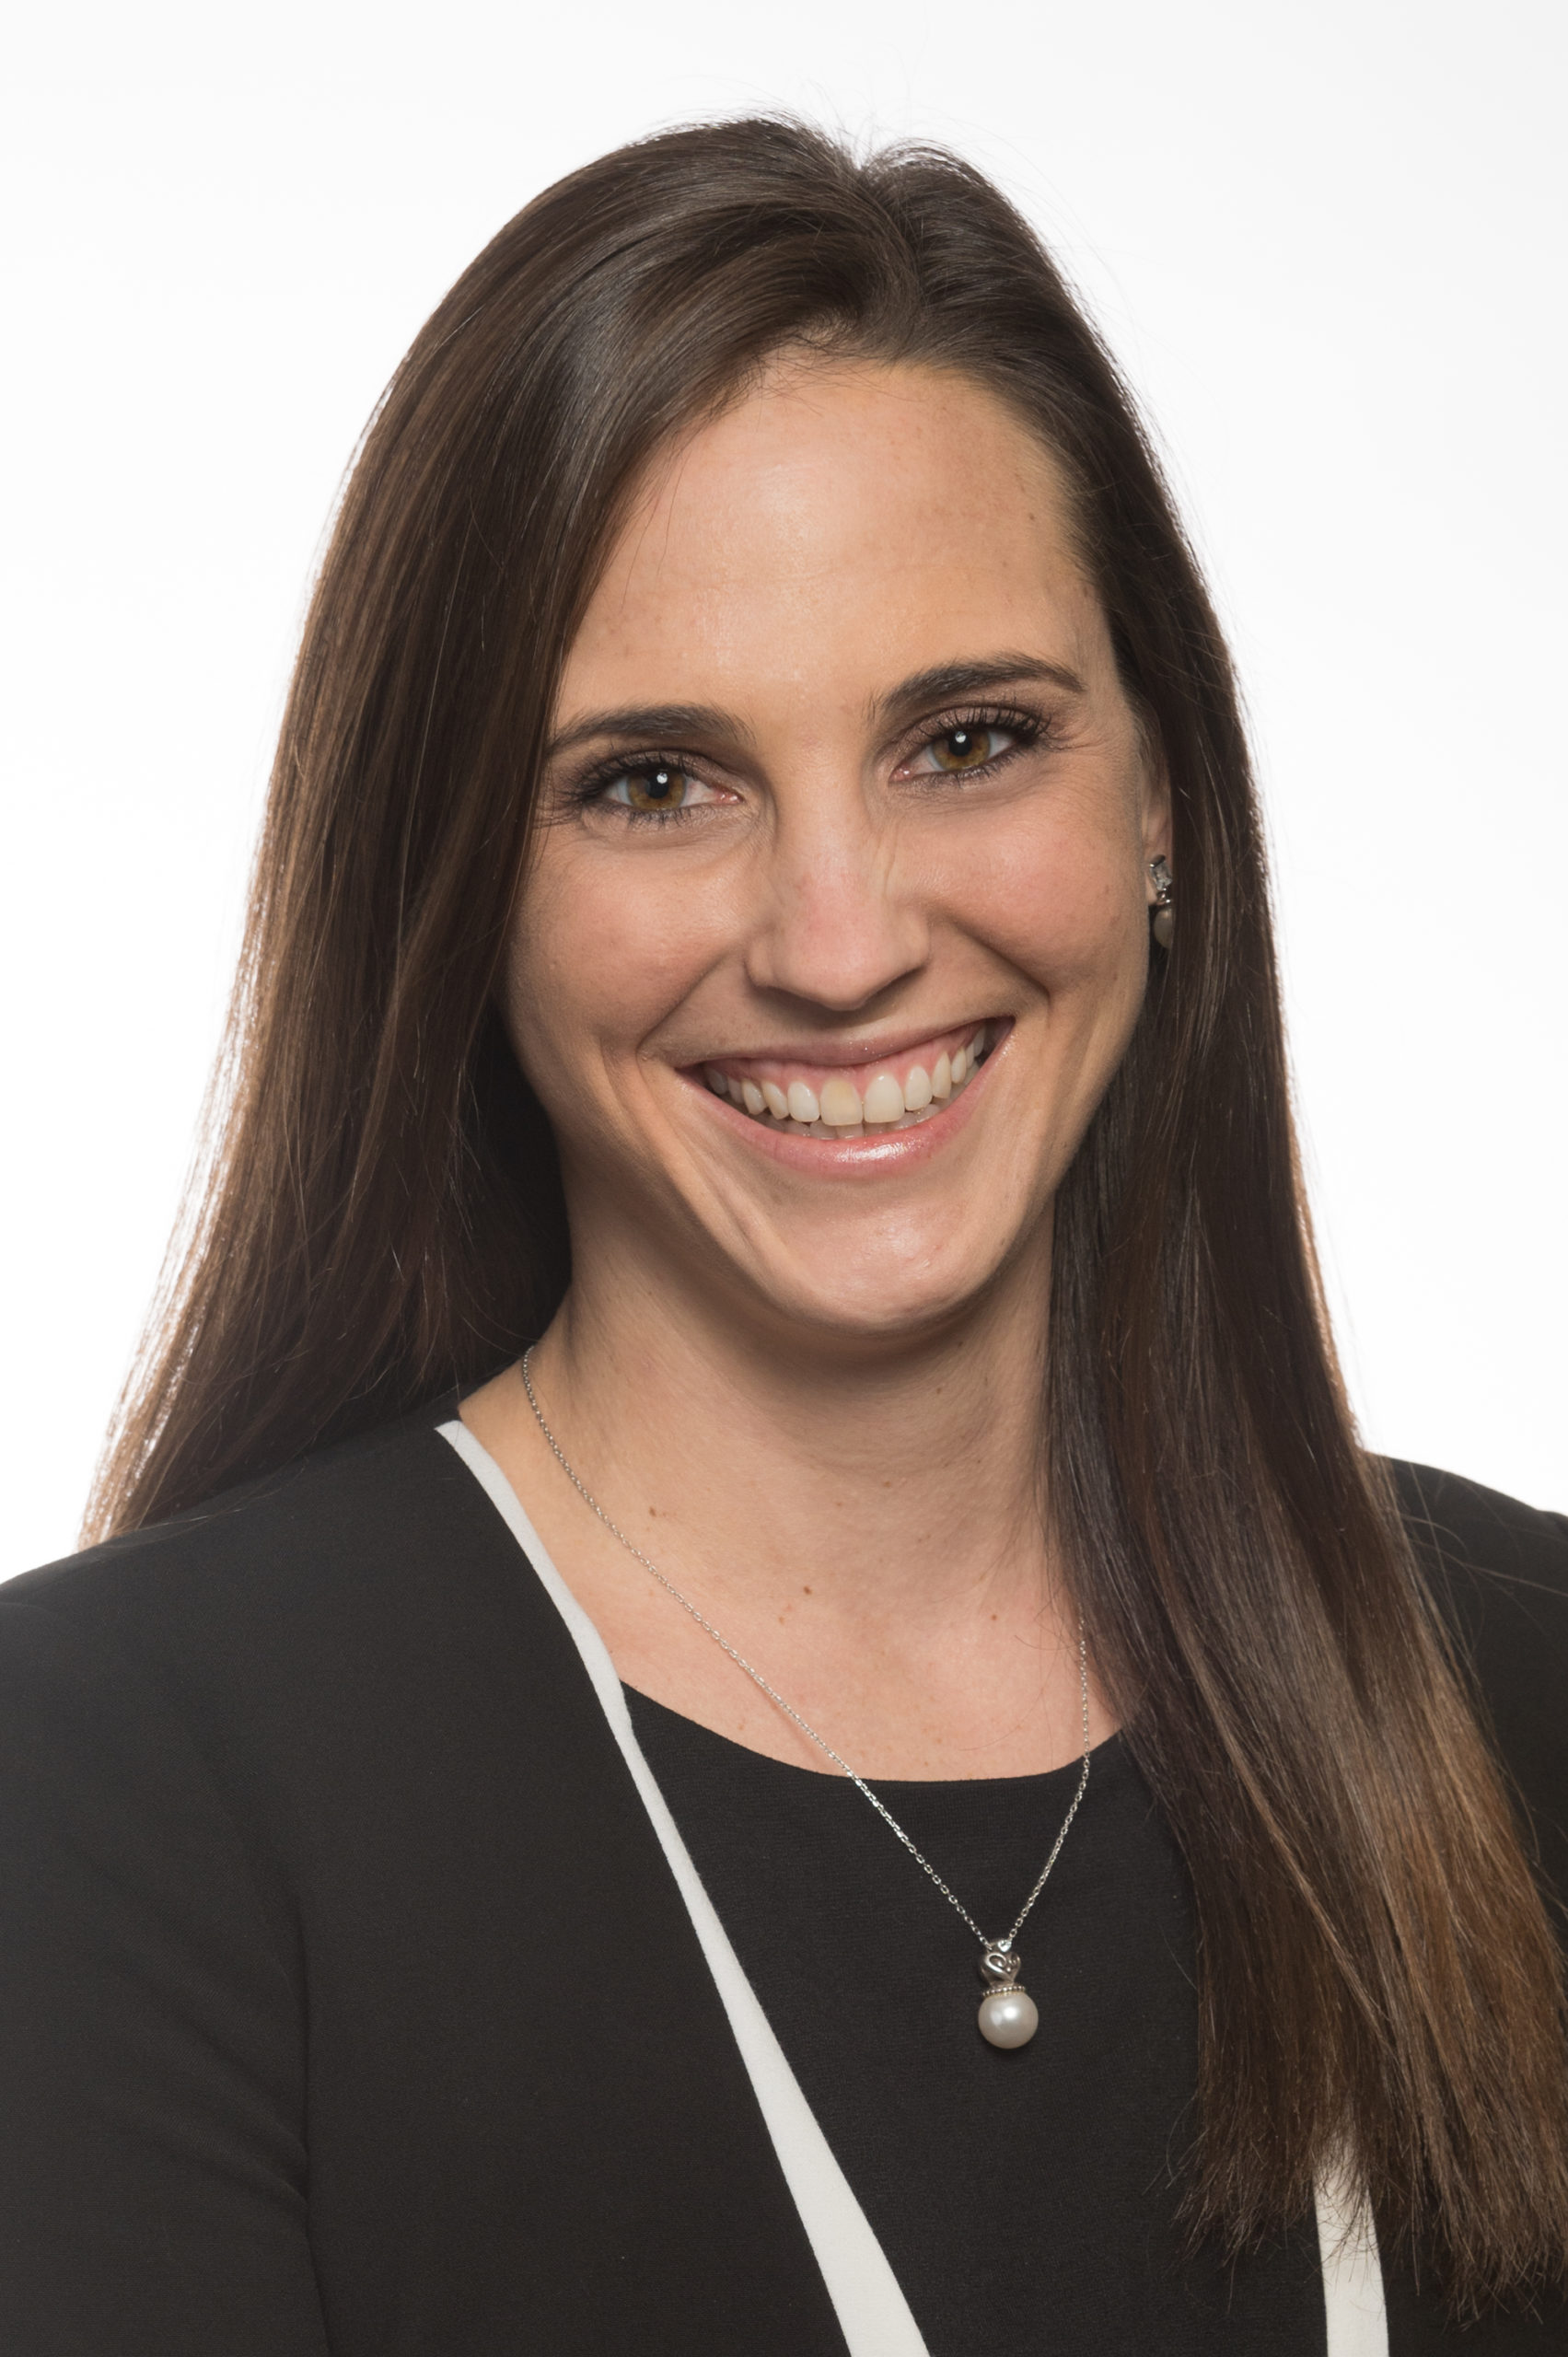 Jacquelyn Kotar